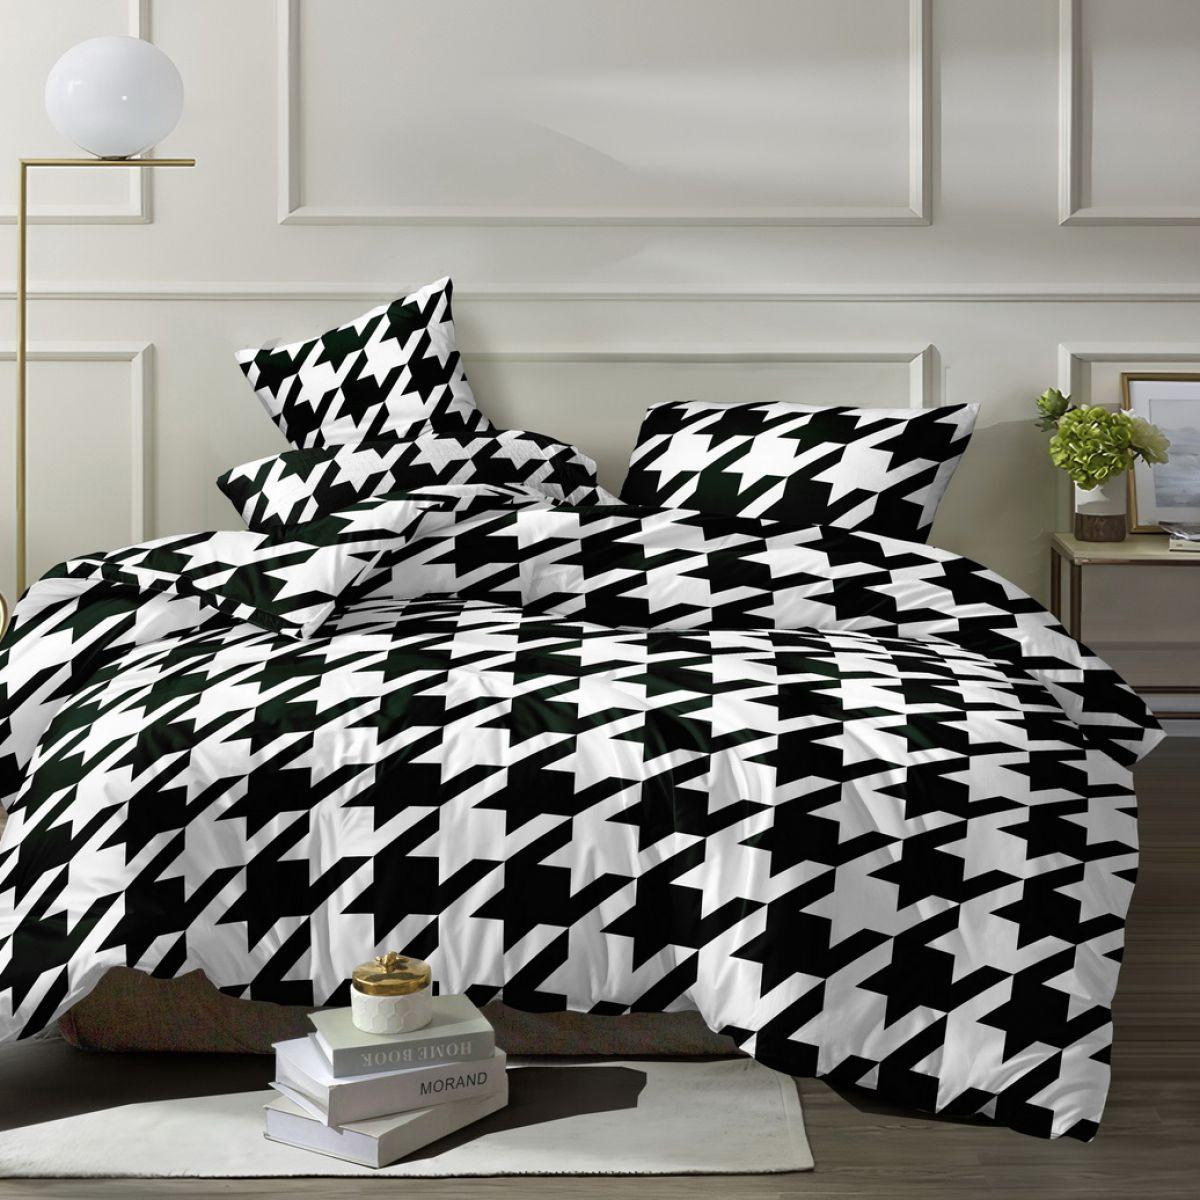 3D Beddings - Antonio - AML-904 - 140x200 cm - 2 pcs